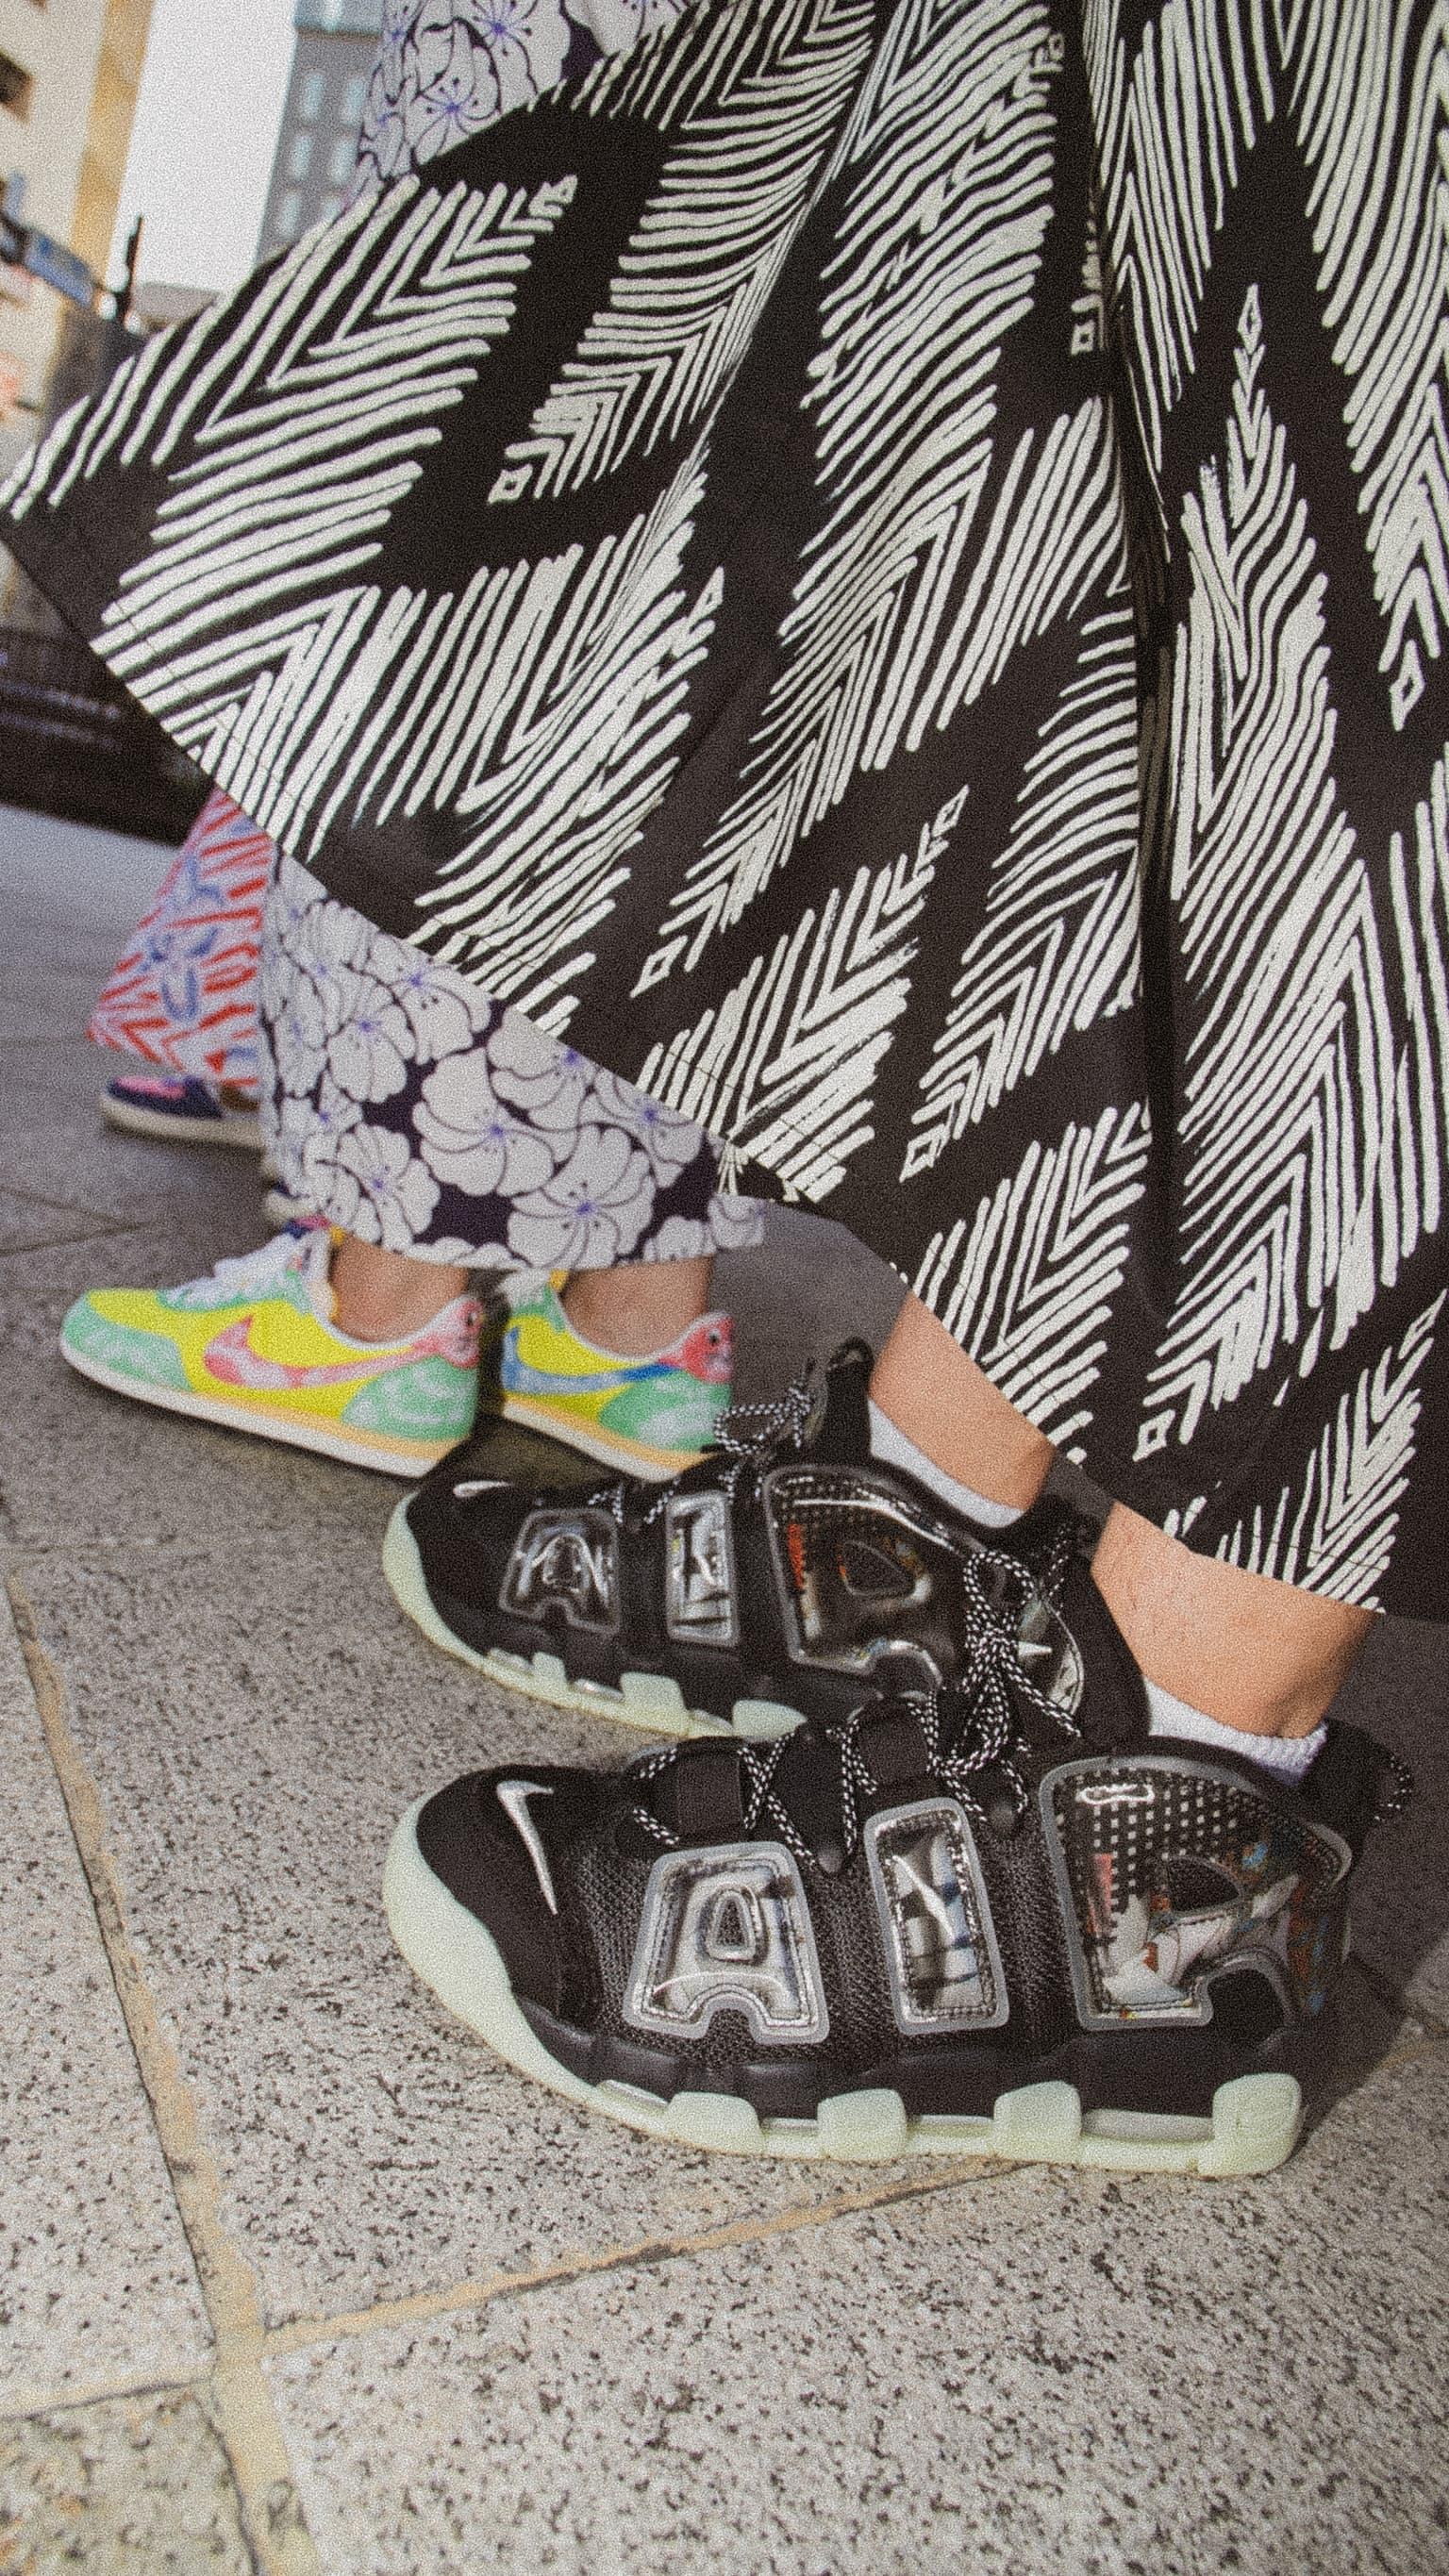 【NIKE公式】JP SNKRS Style: Retro Summer